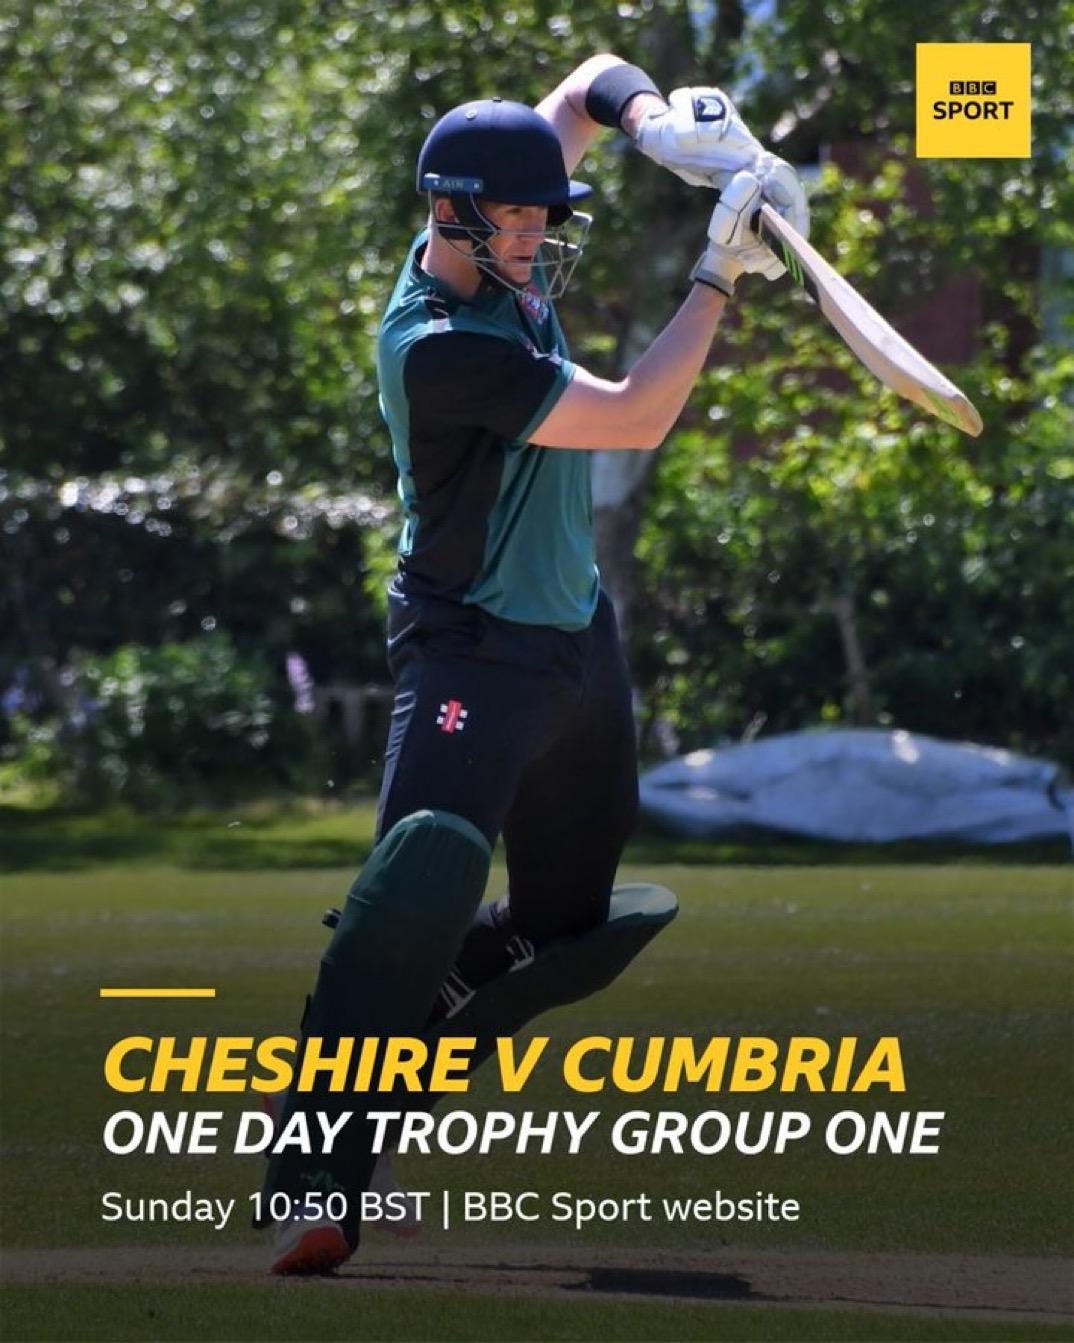 BBC Radio online coverage of Cheshire v Cumbria plus LIVE STREAMING